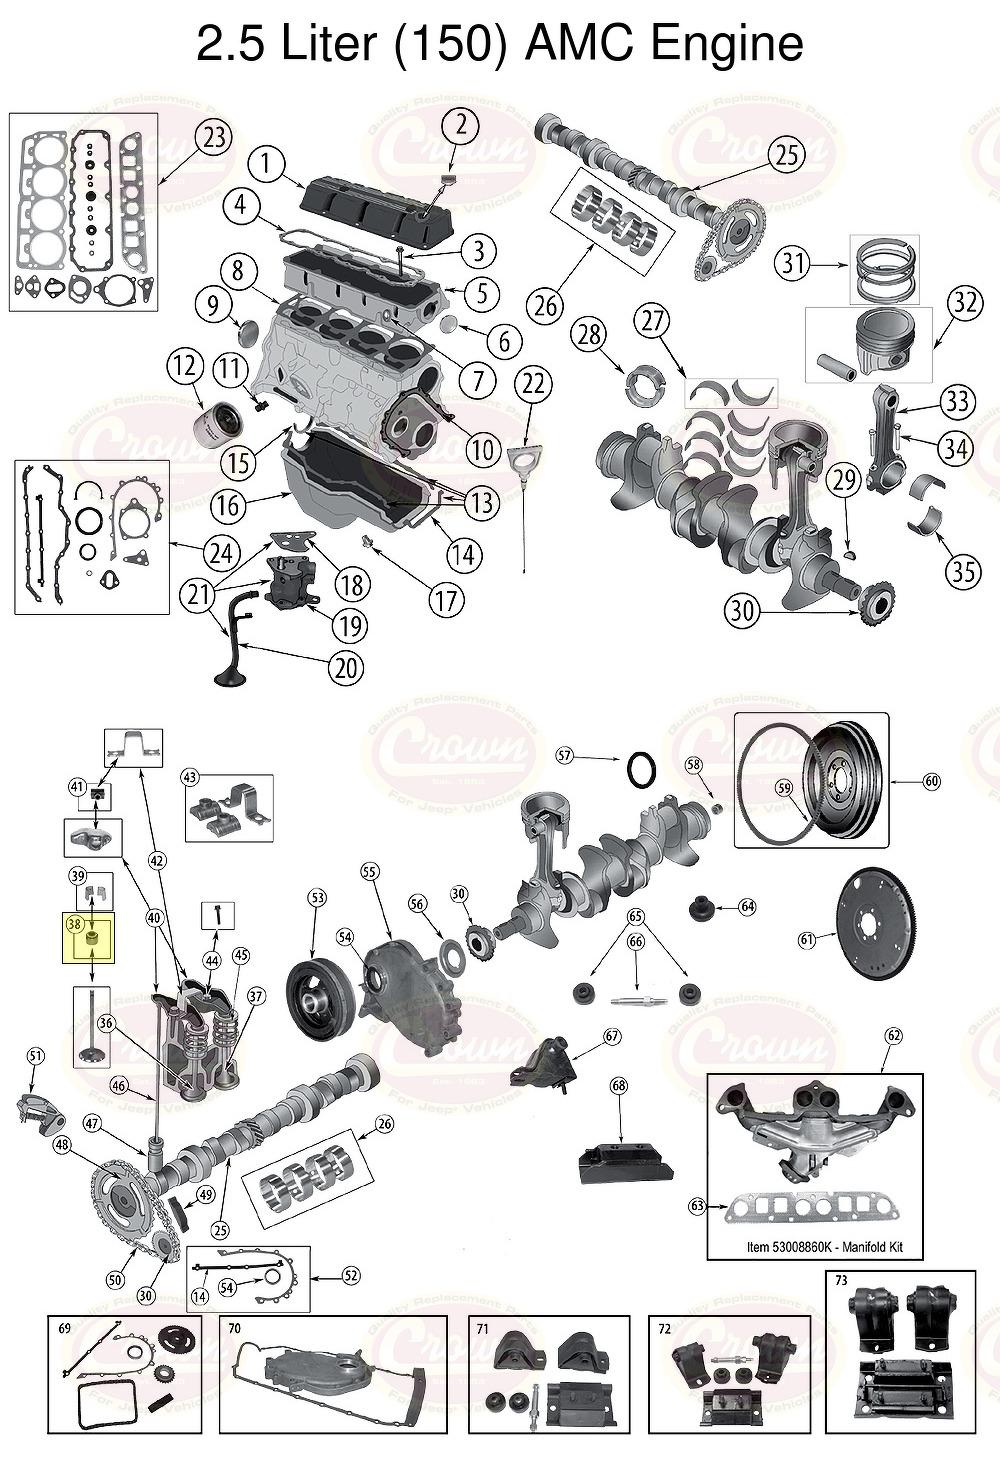 Ventilschaftdichtung Jeep Wrangler Yj 1987  1995  2 5 L 4 0